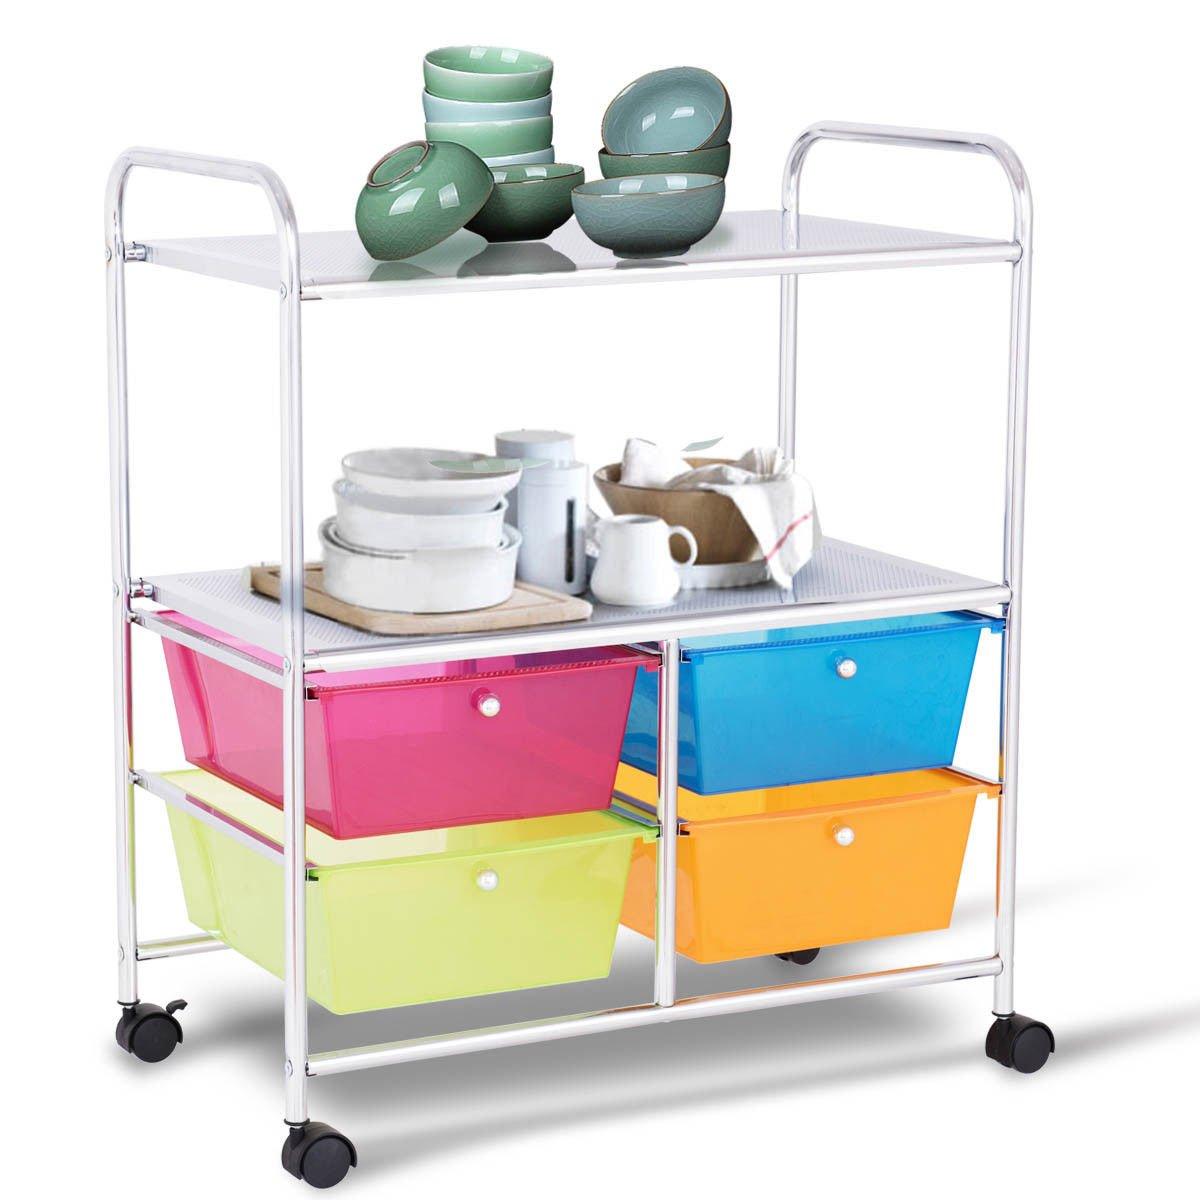 Giantex Rolling Storage Cart w/ 4 Drawers 2 Shelves Metal Rack Shelf Home Office School Beauty Salon Utility Organizer Cart with Wheels (Blue Green Orange & Red) by Giantex (Image #4)